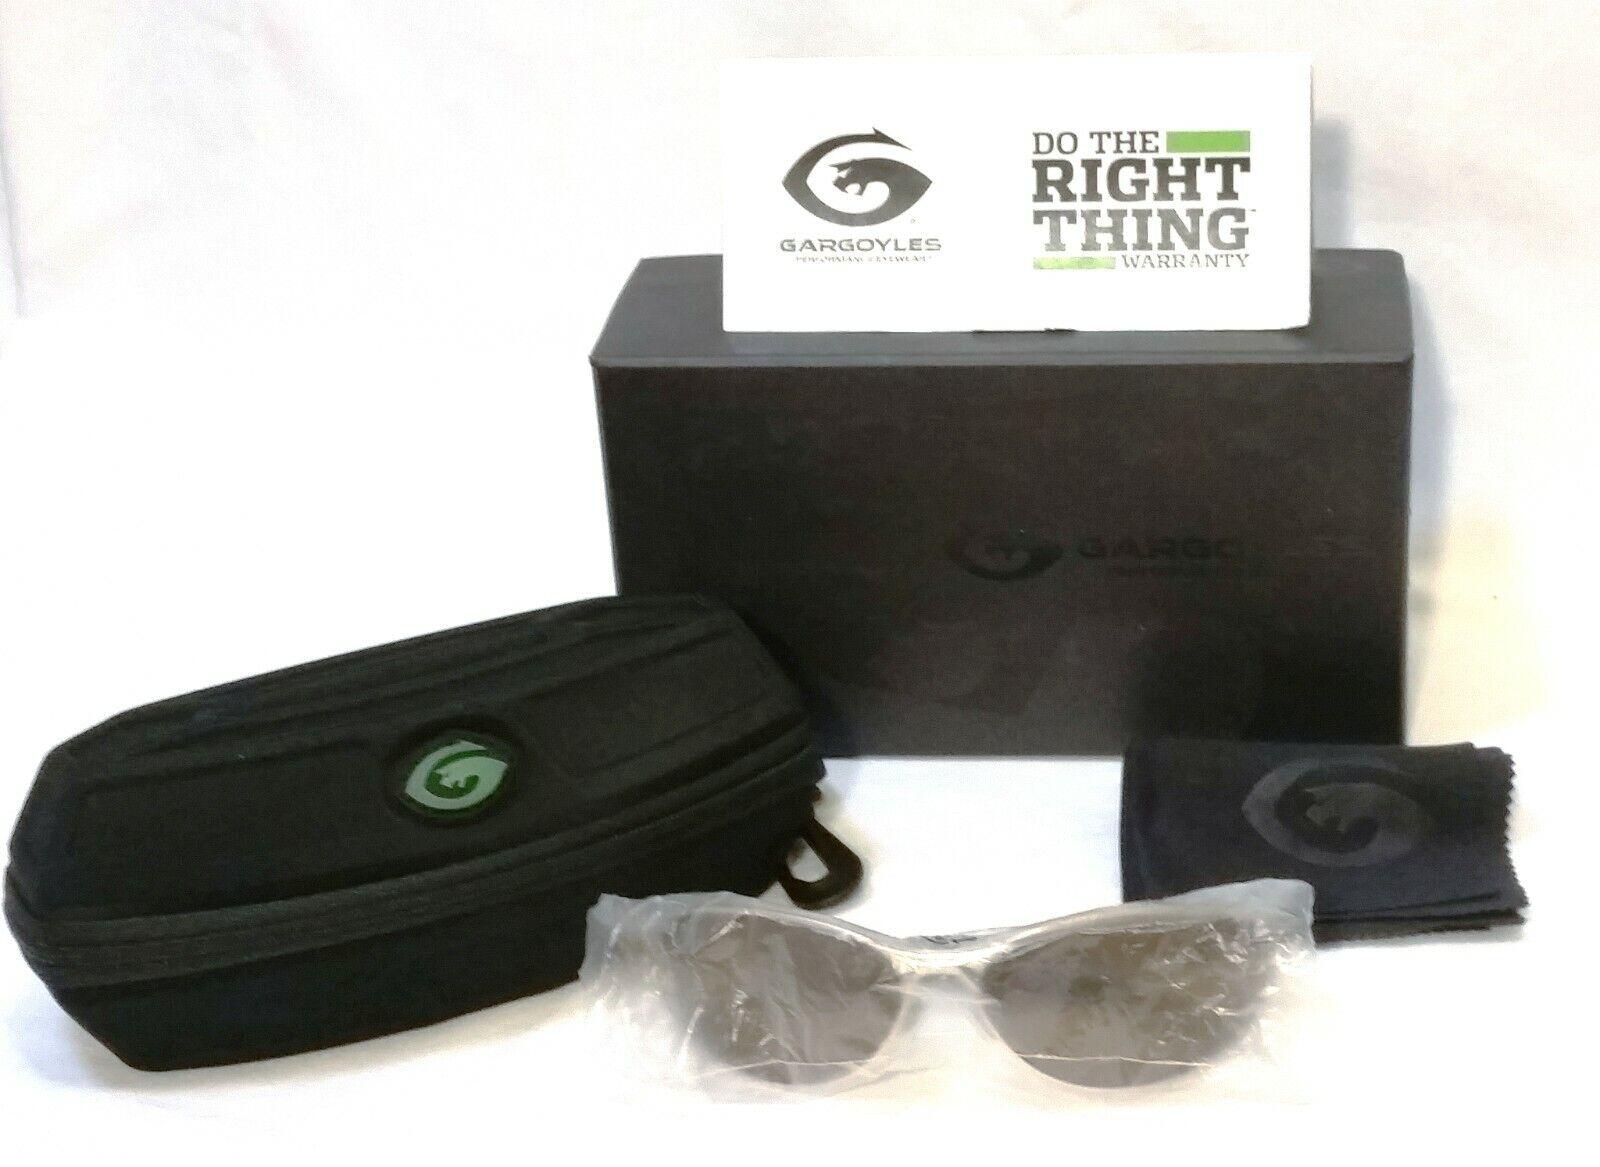 Gargoyles Outrider Sunglasses - Polarised + Case + box + polish cloth